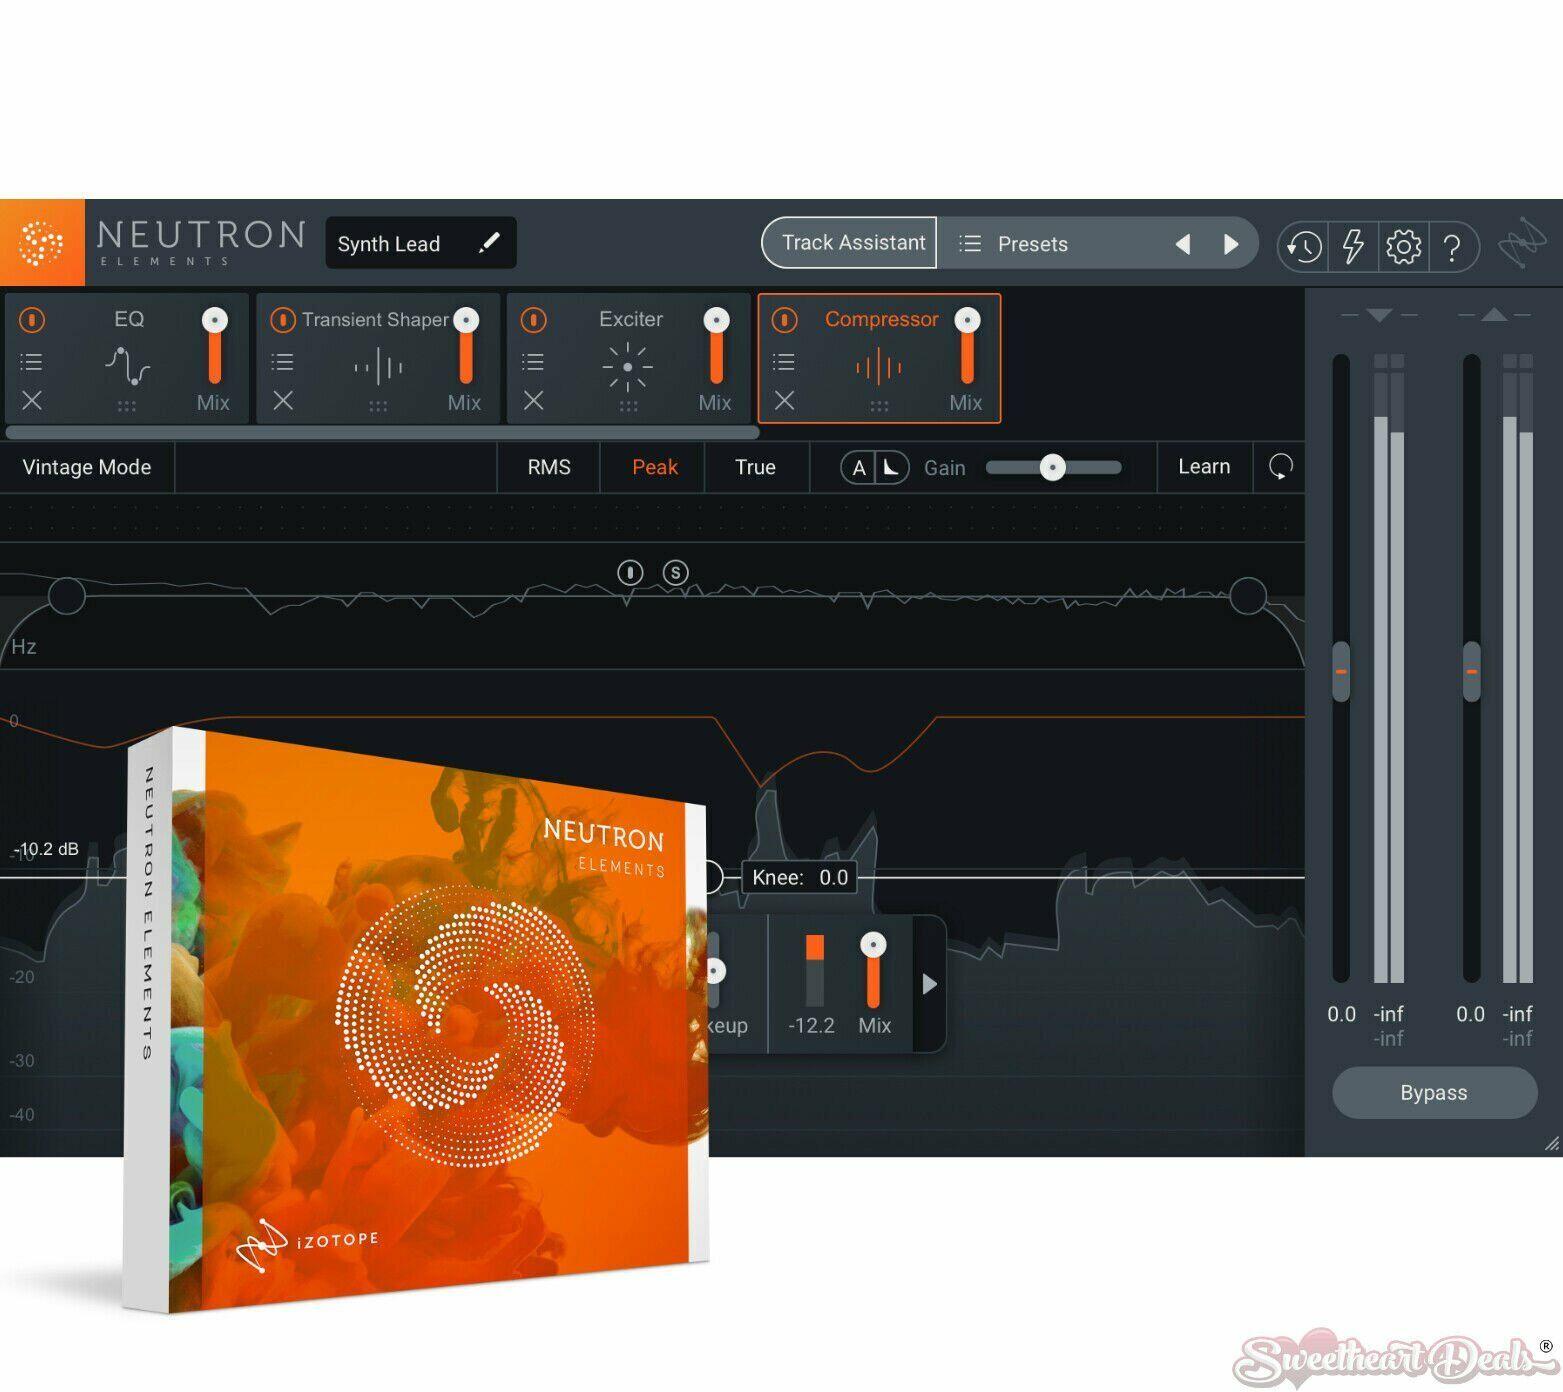 IZotope Neutron Elements Version 3 Audio Mixing Software - Download